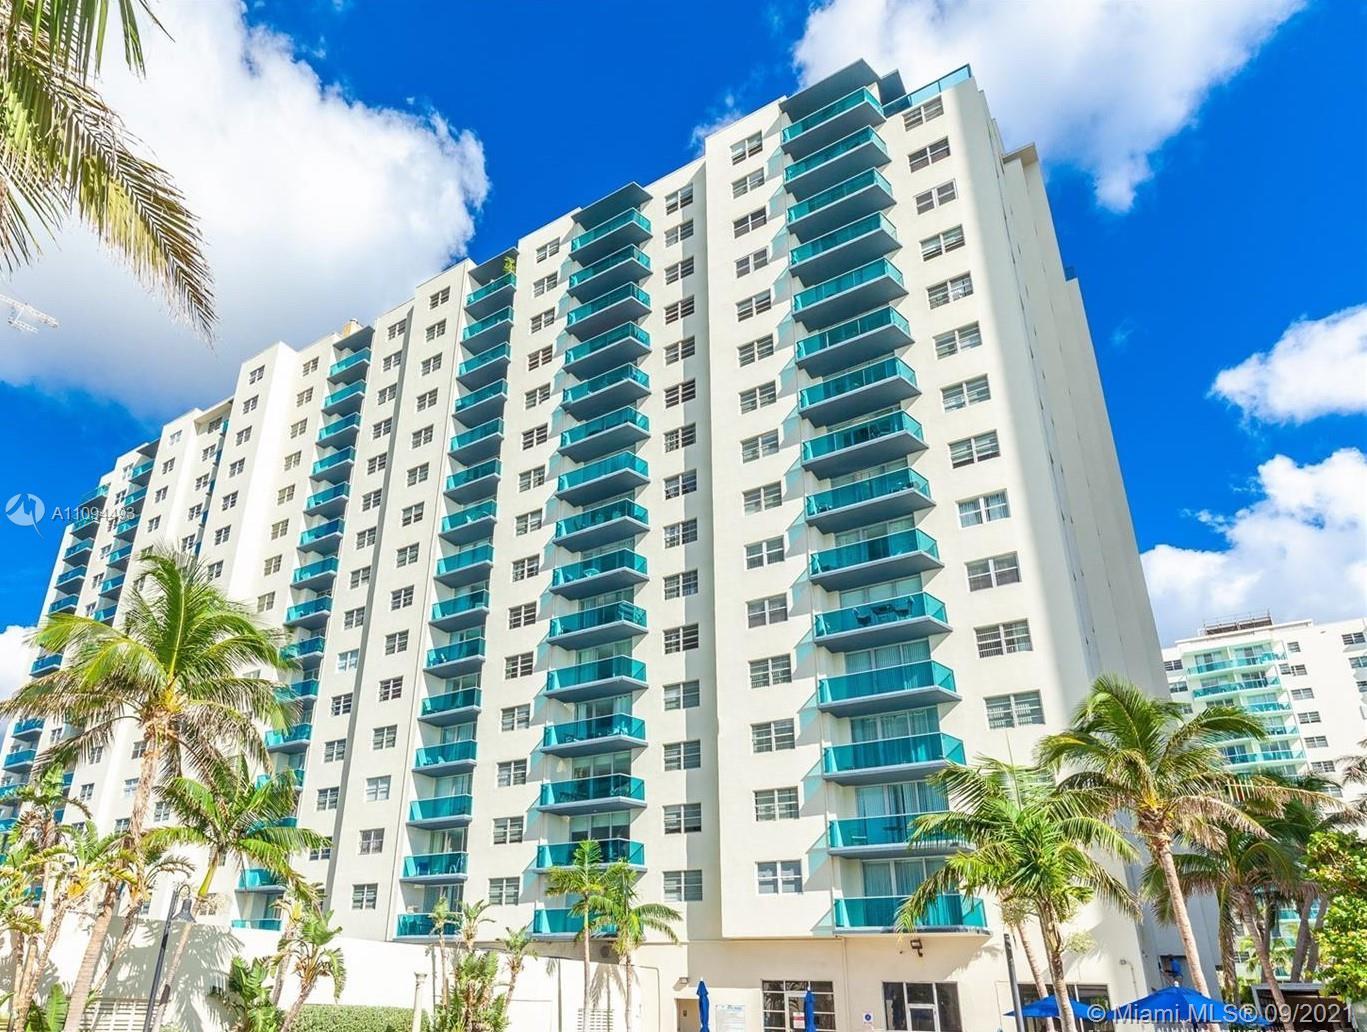 Sian Ocean Residences #6G - 4001 S Ocean Dr #6G, Hollywood, FL 33019